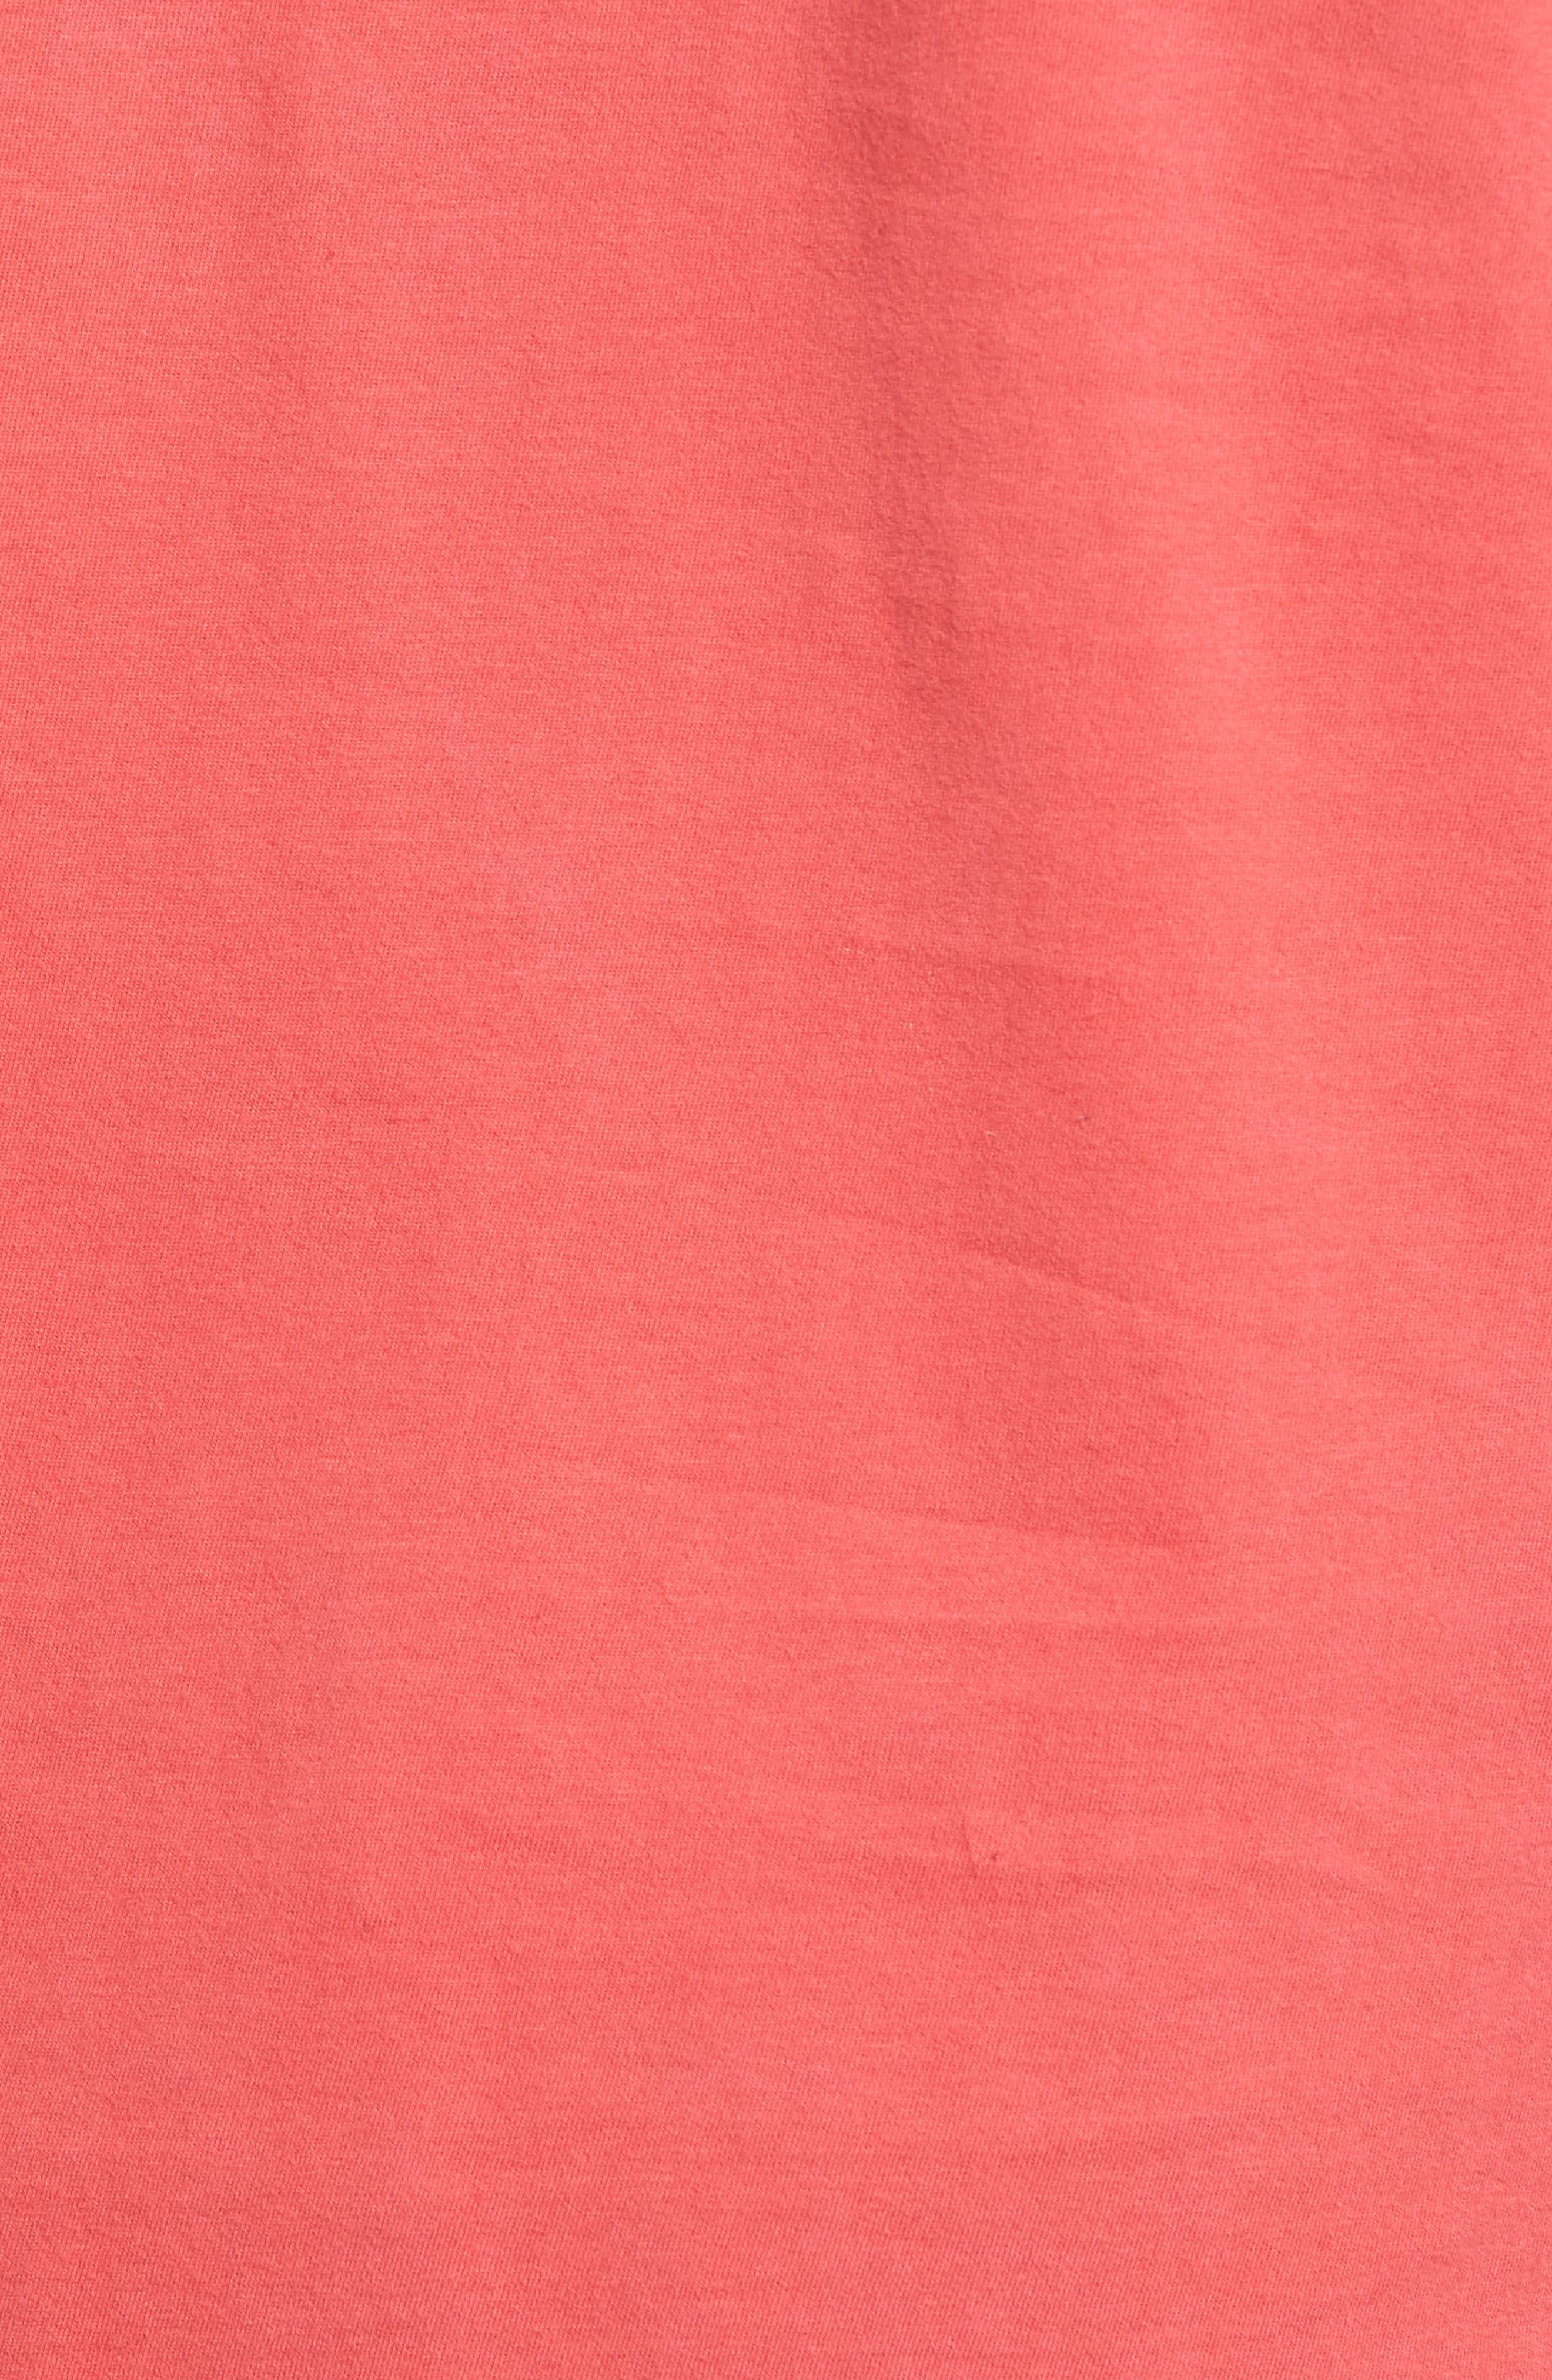 Eastwood Cincinnati Reds T-Shirt,                             Alternate thumbnail 5, color,